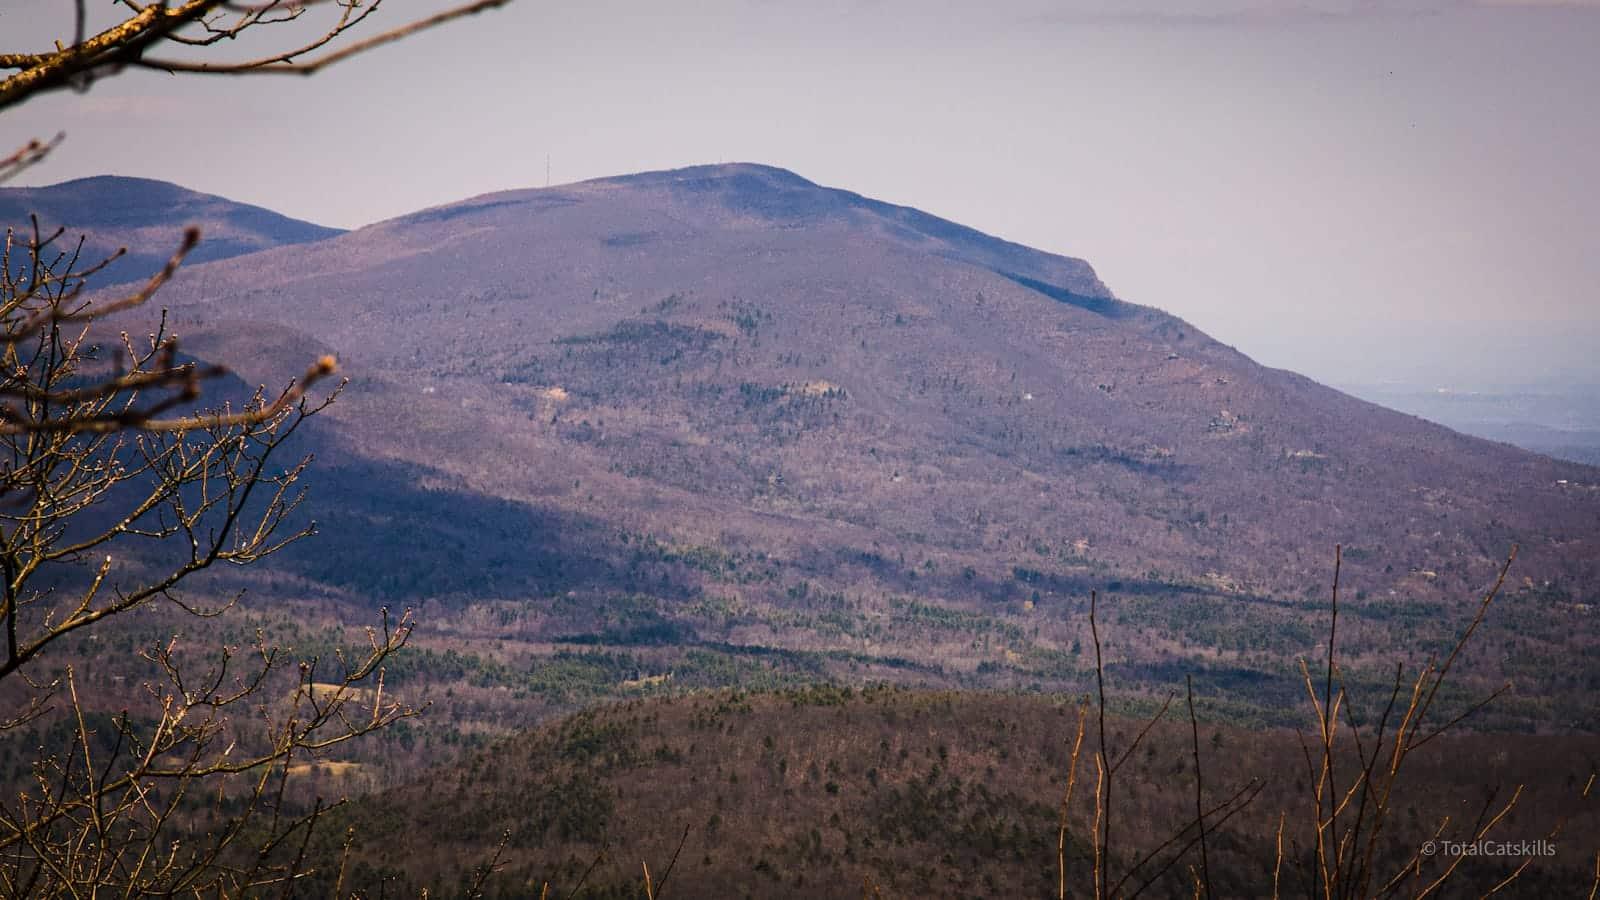 overlook mountain in distance